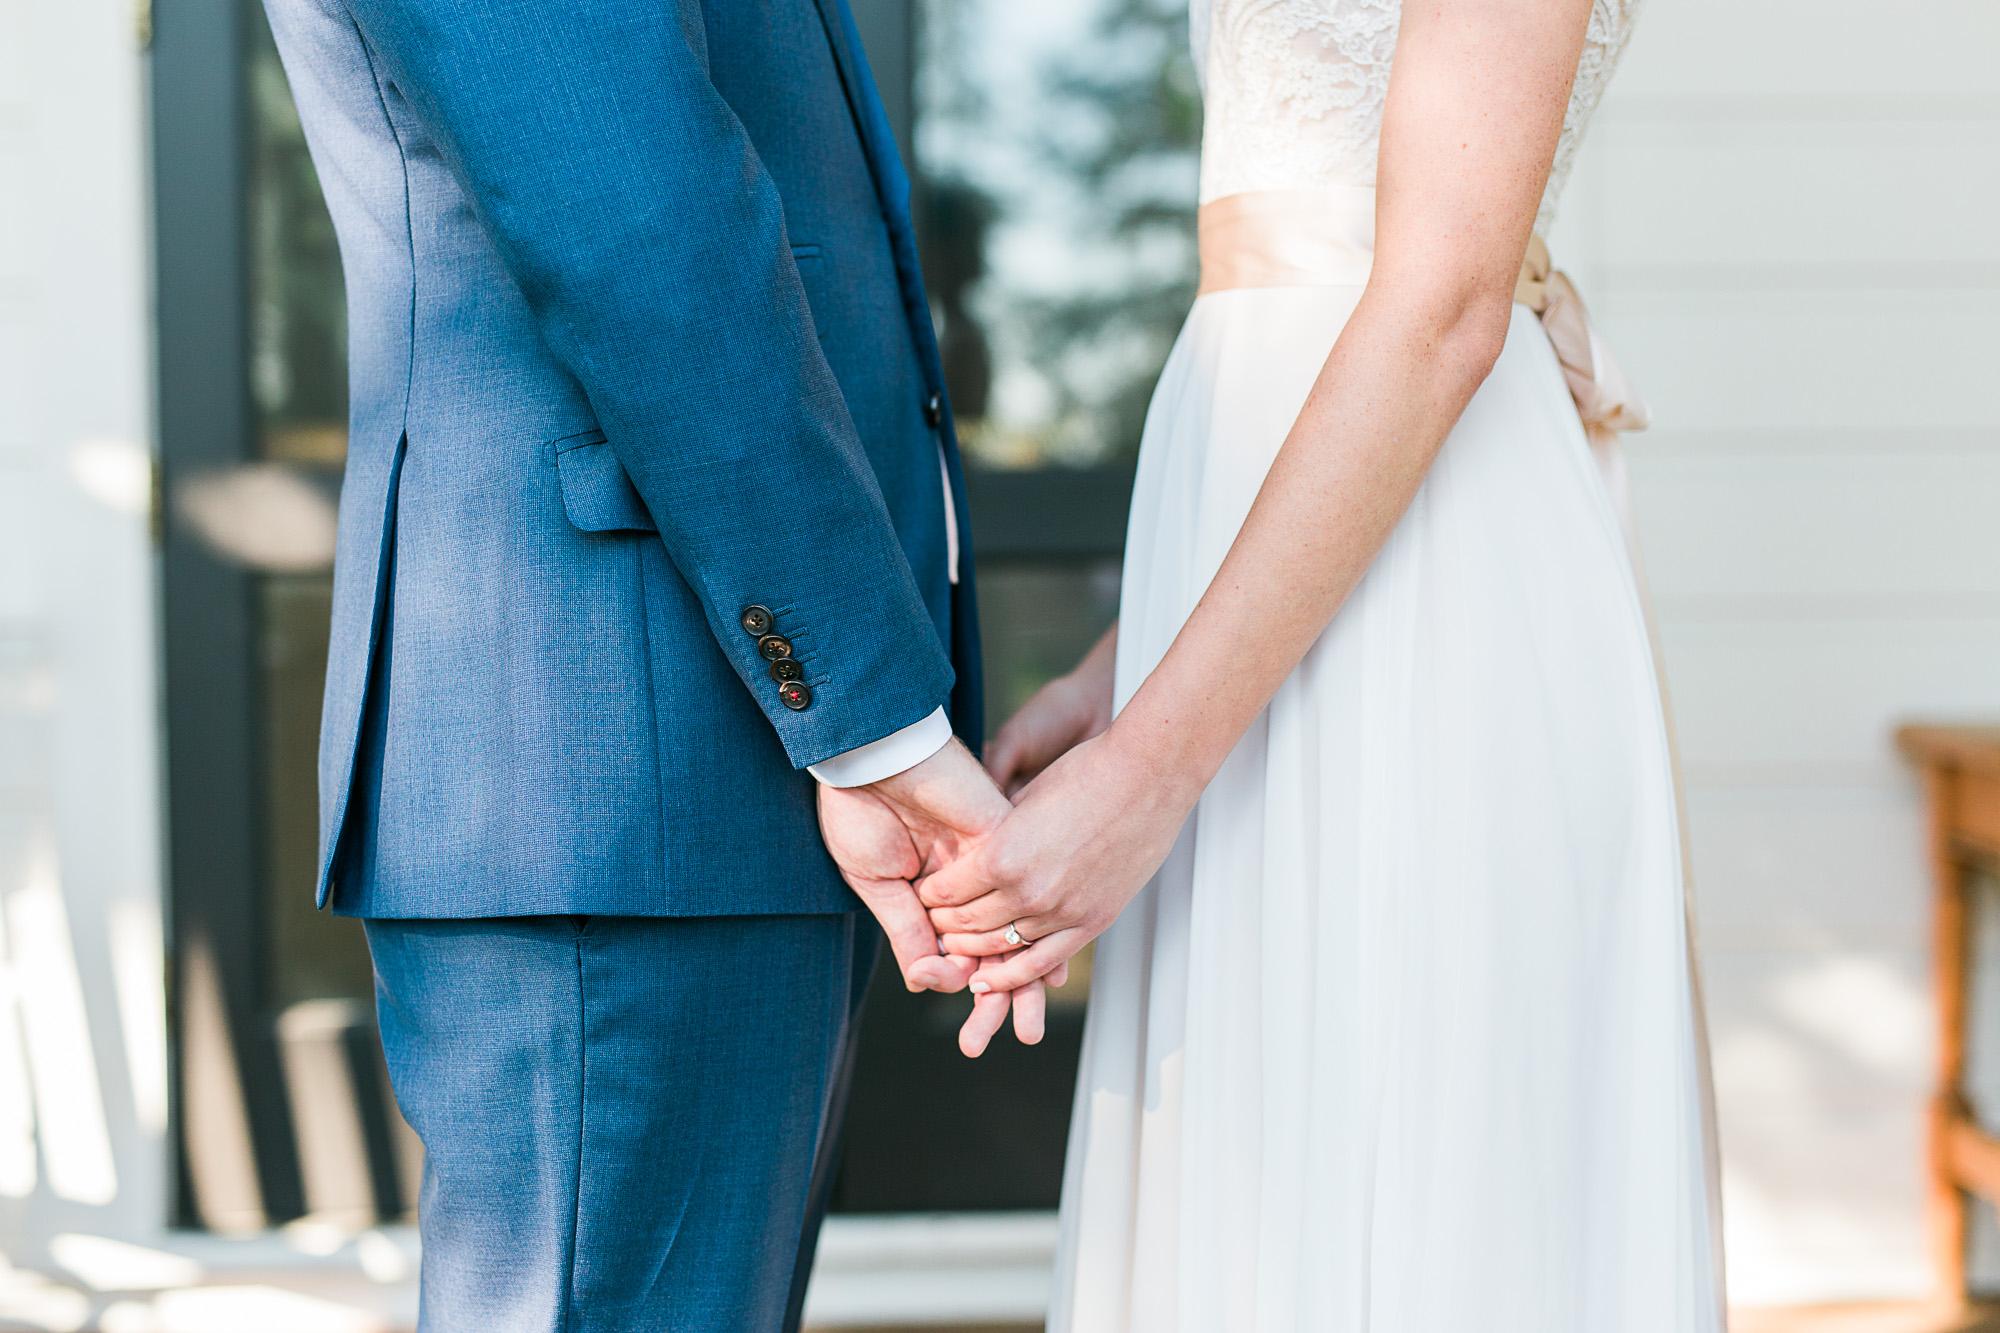 Generals Daughter Wedding Photos by JBJ Pictures - Ramekins Wedding Venue Photographer in Sonoma, Napa (11).jpg